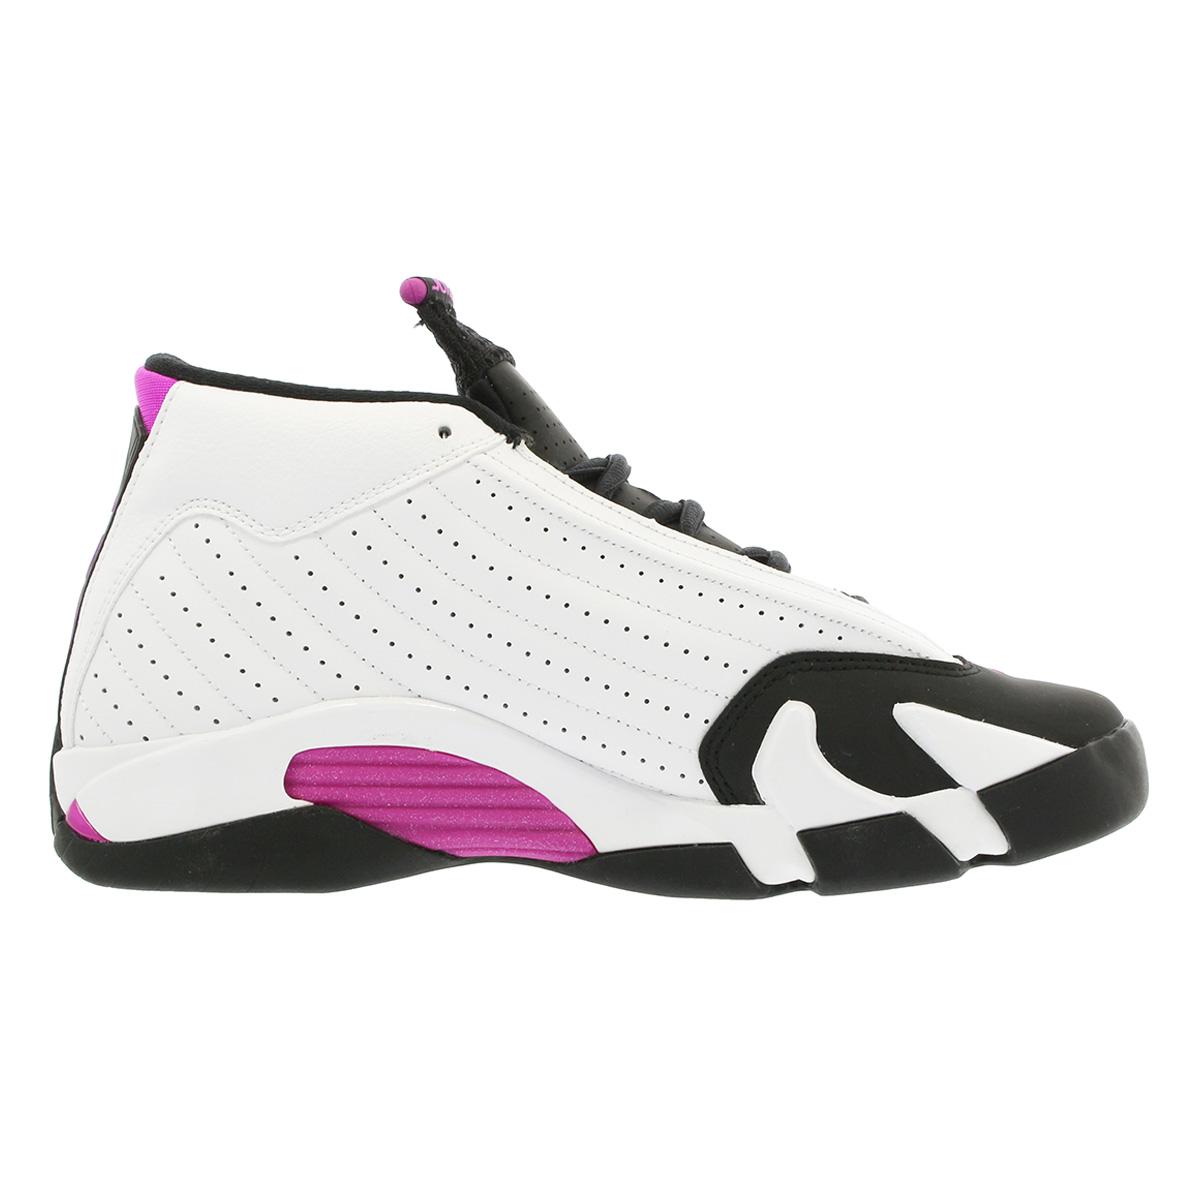 the latest fadd1 15bbe NIKE AIR JORDAN 14 RETRO GS Nike Air Jordan 14 nostalgic GS WHITE/FUCHSIA  FLASH/BLACK 654,969-119